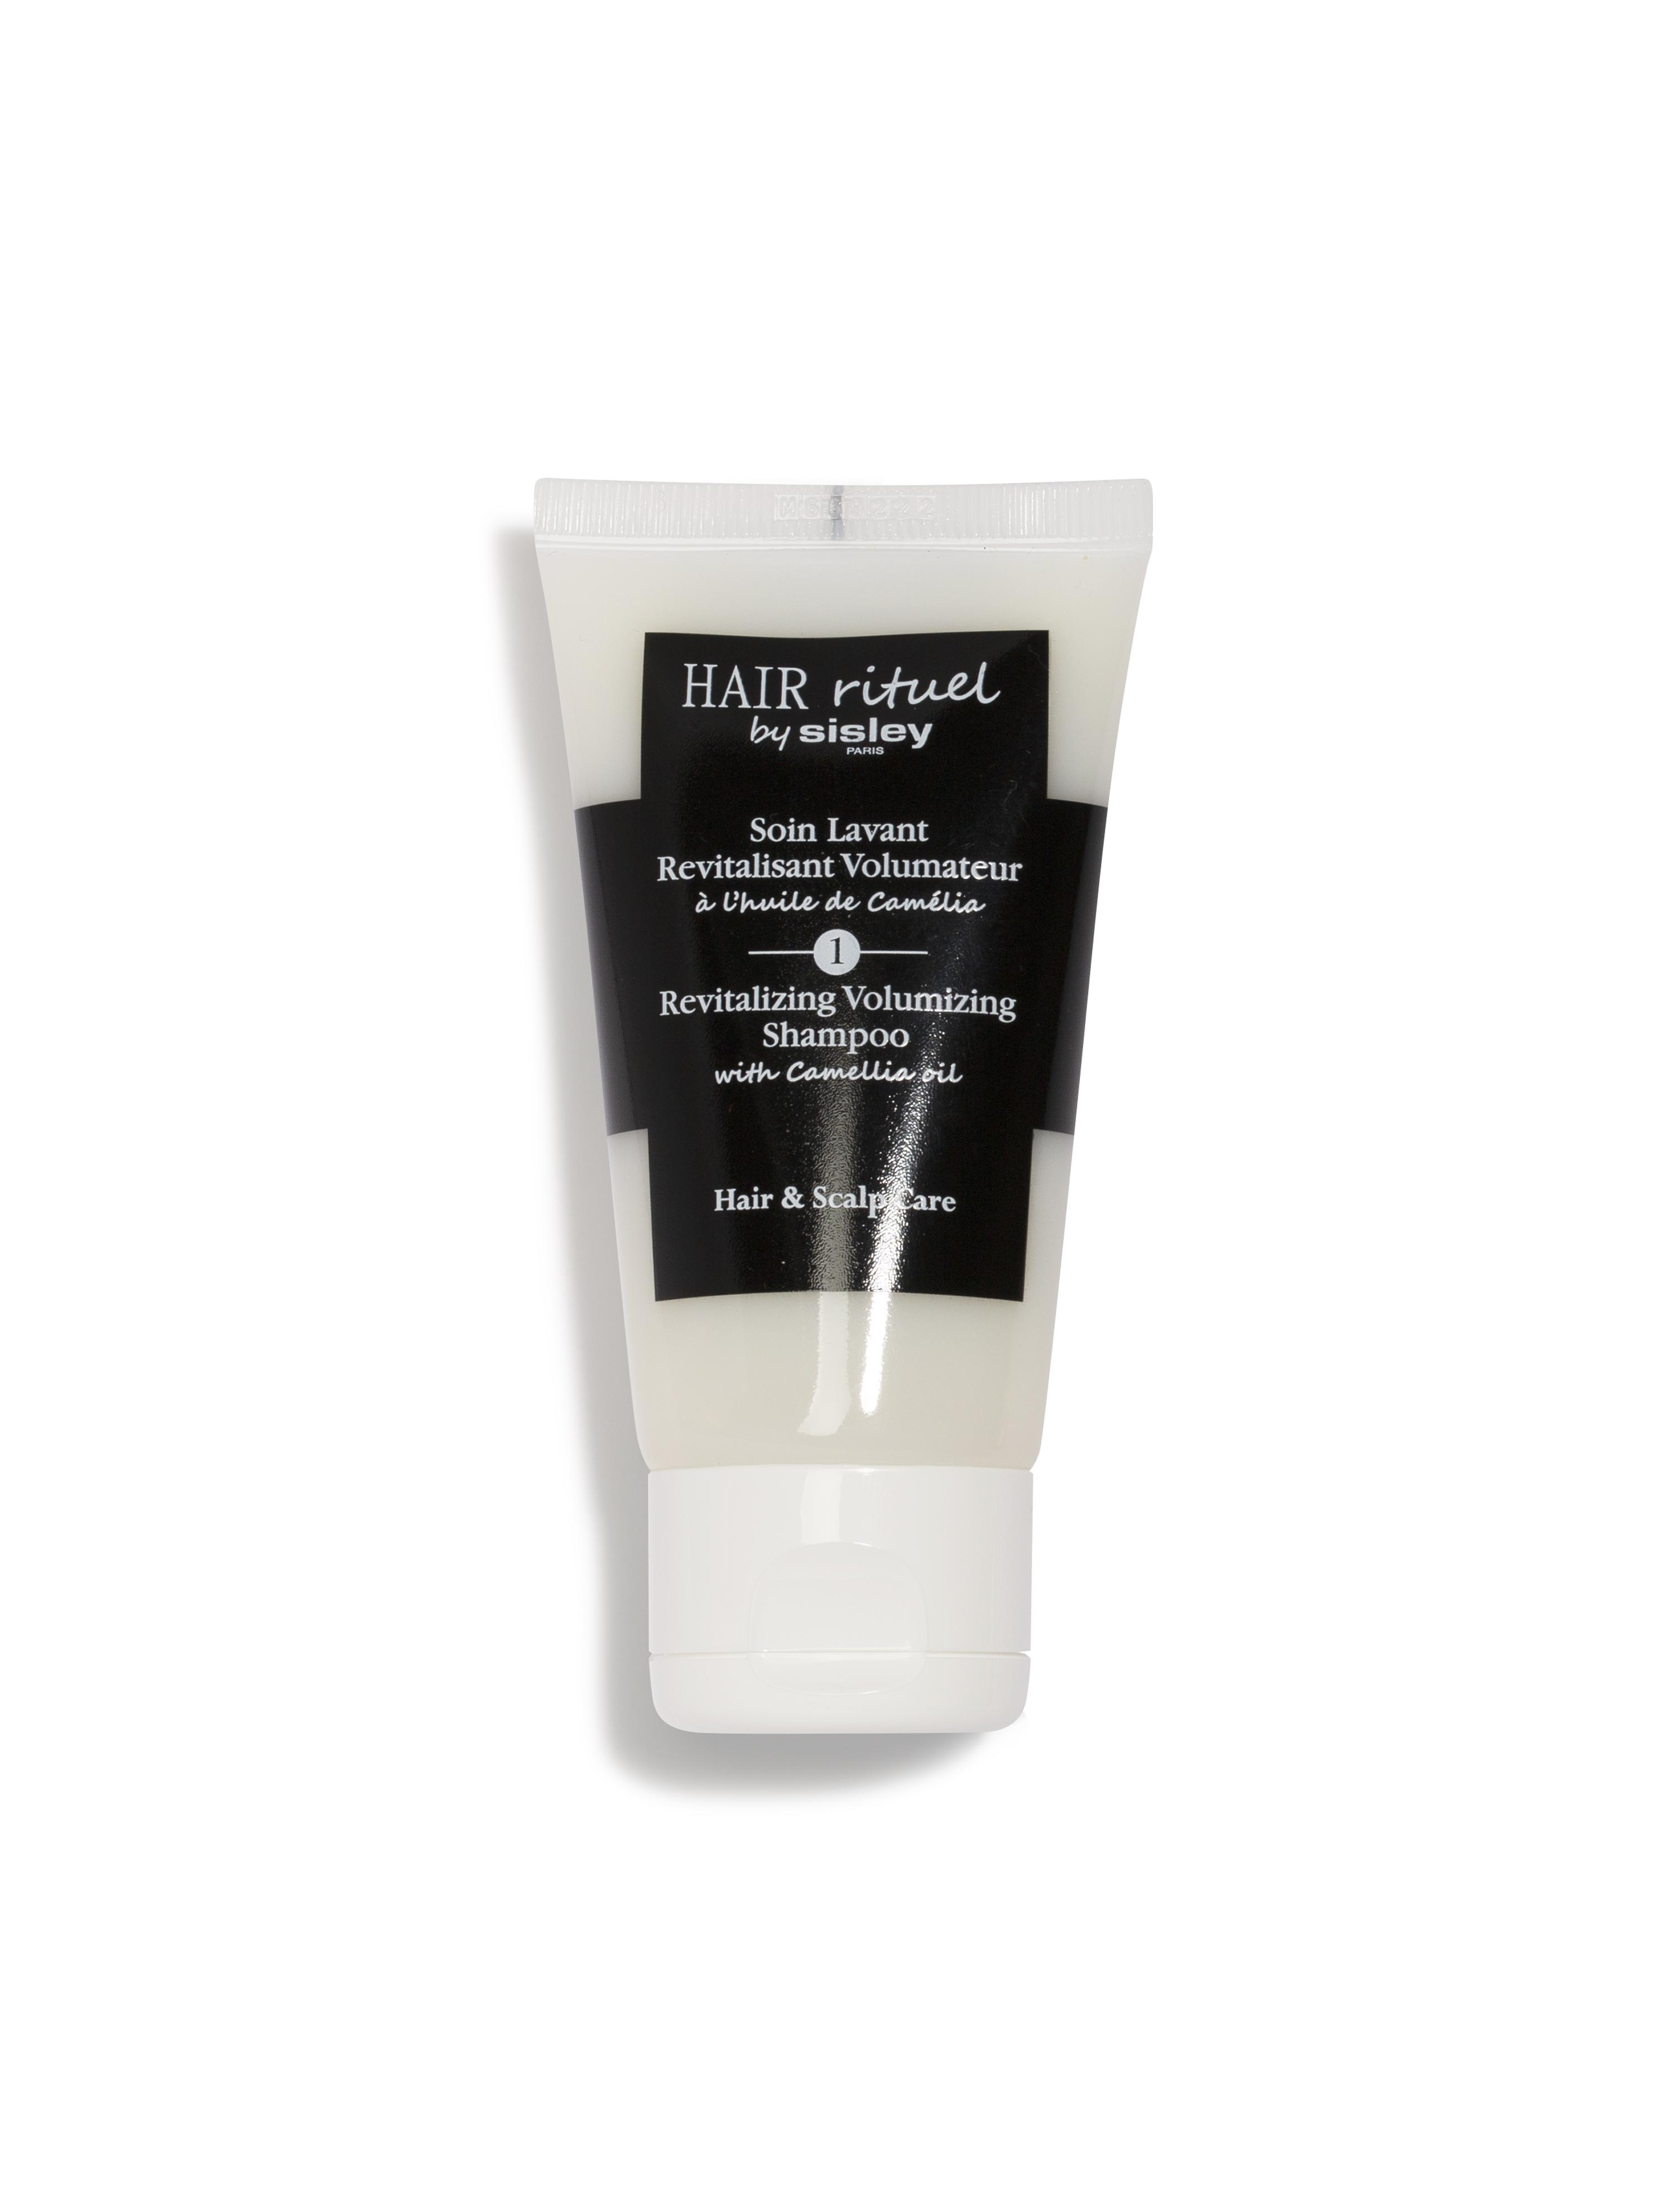 Hair Rituel by Sisley Revitalizing Volumizing Shampoo (50 ml)